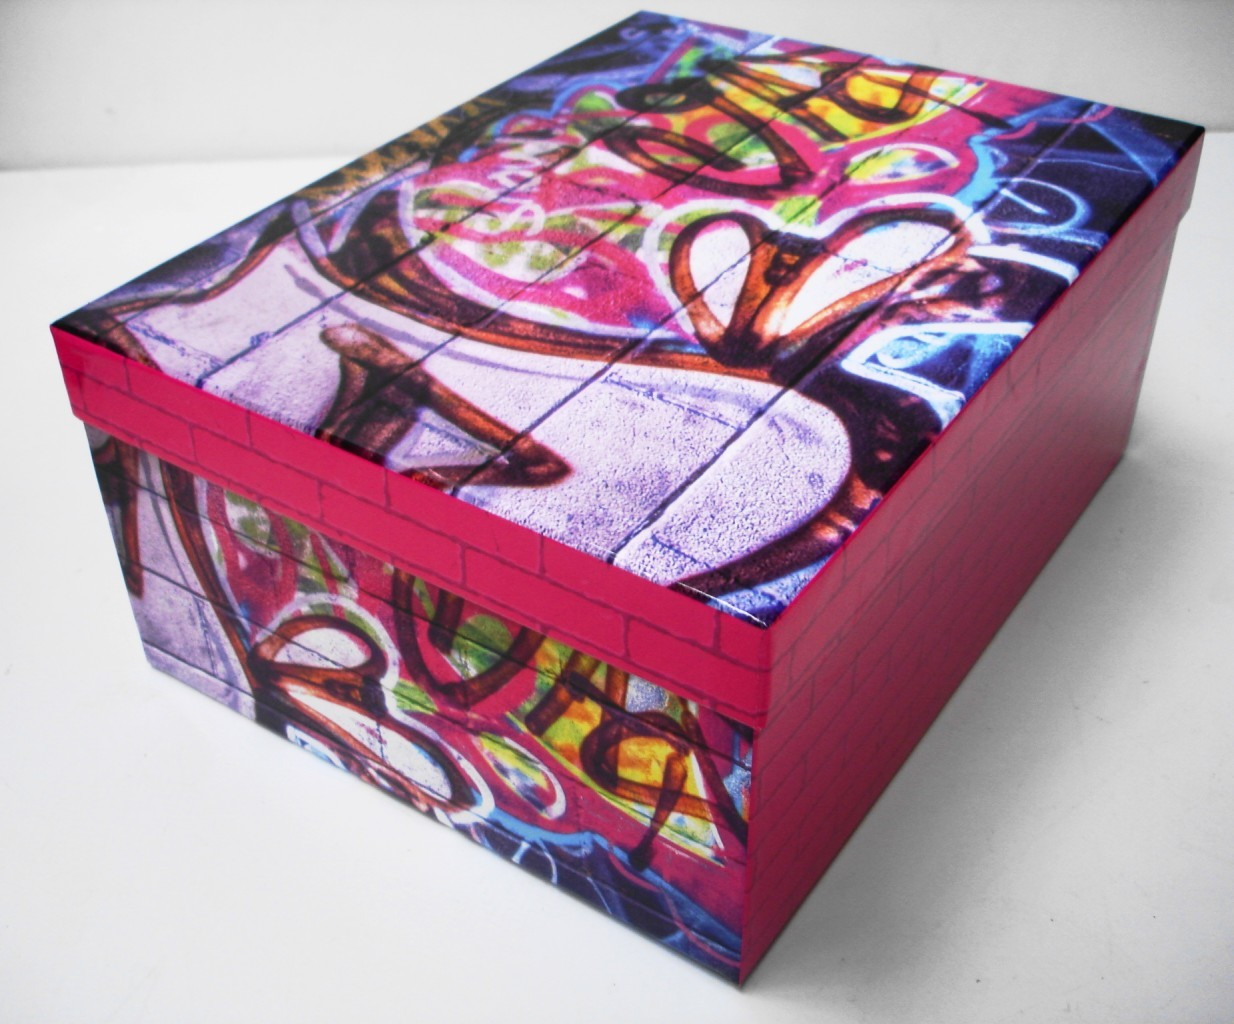 nyc or guitar christmas birthday cardboard gift box craft. Black Bedroom Furniture Sets. Home Design Ideas